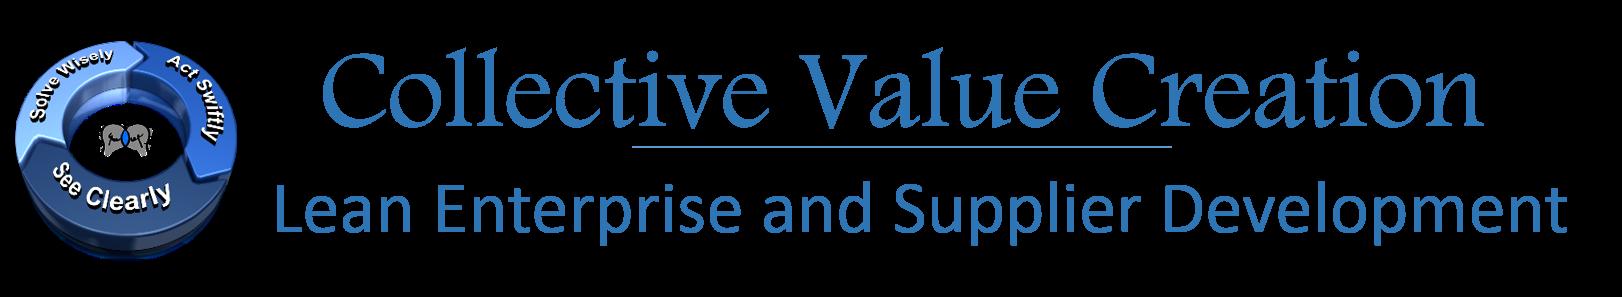 collective value creation website logo enterprise and